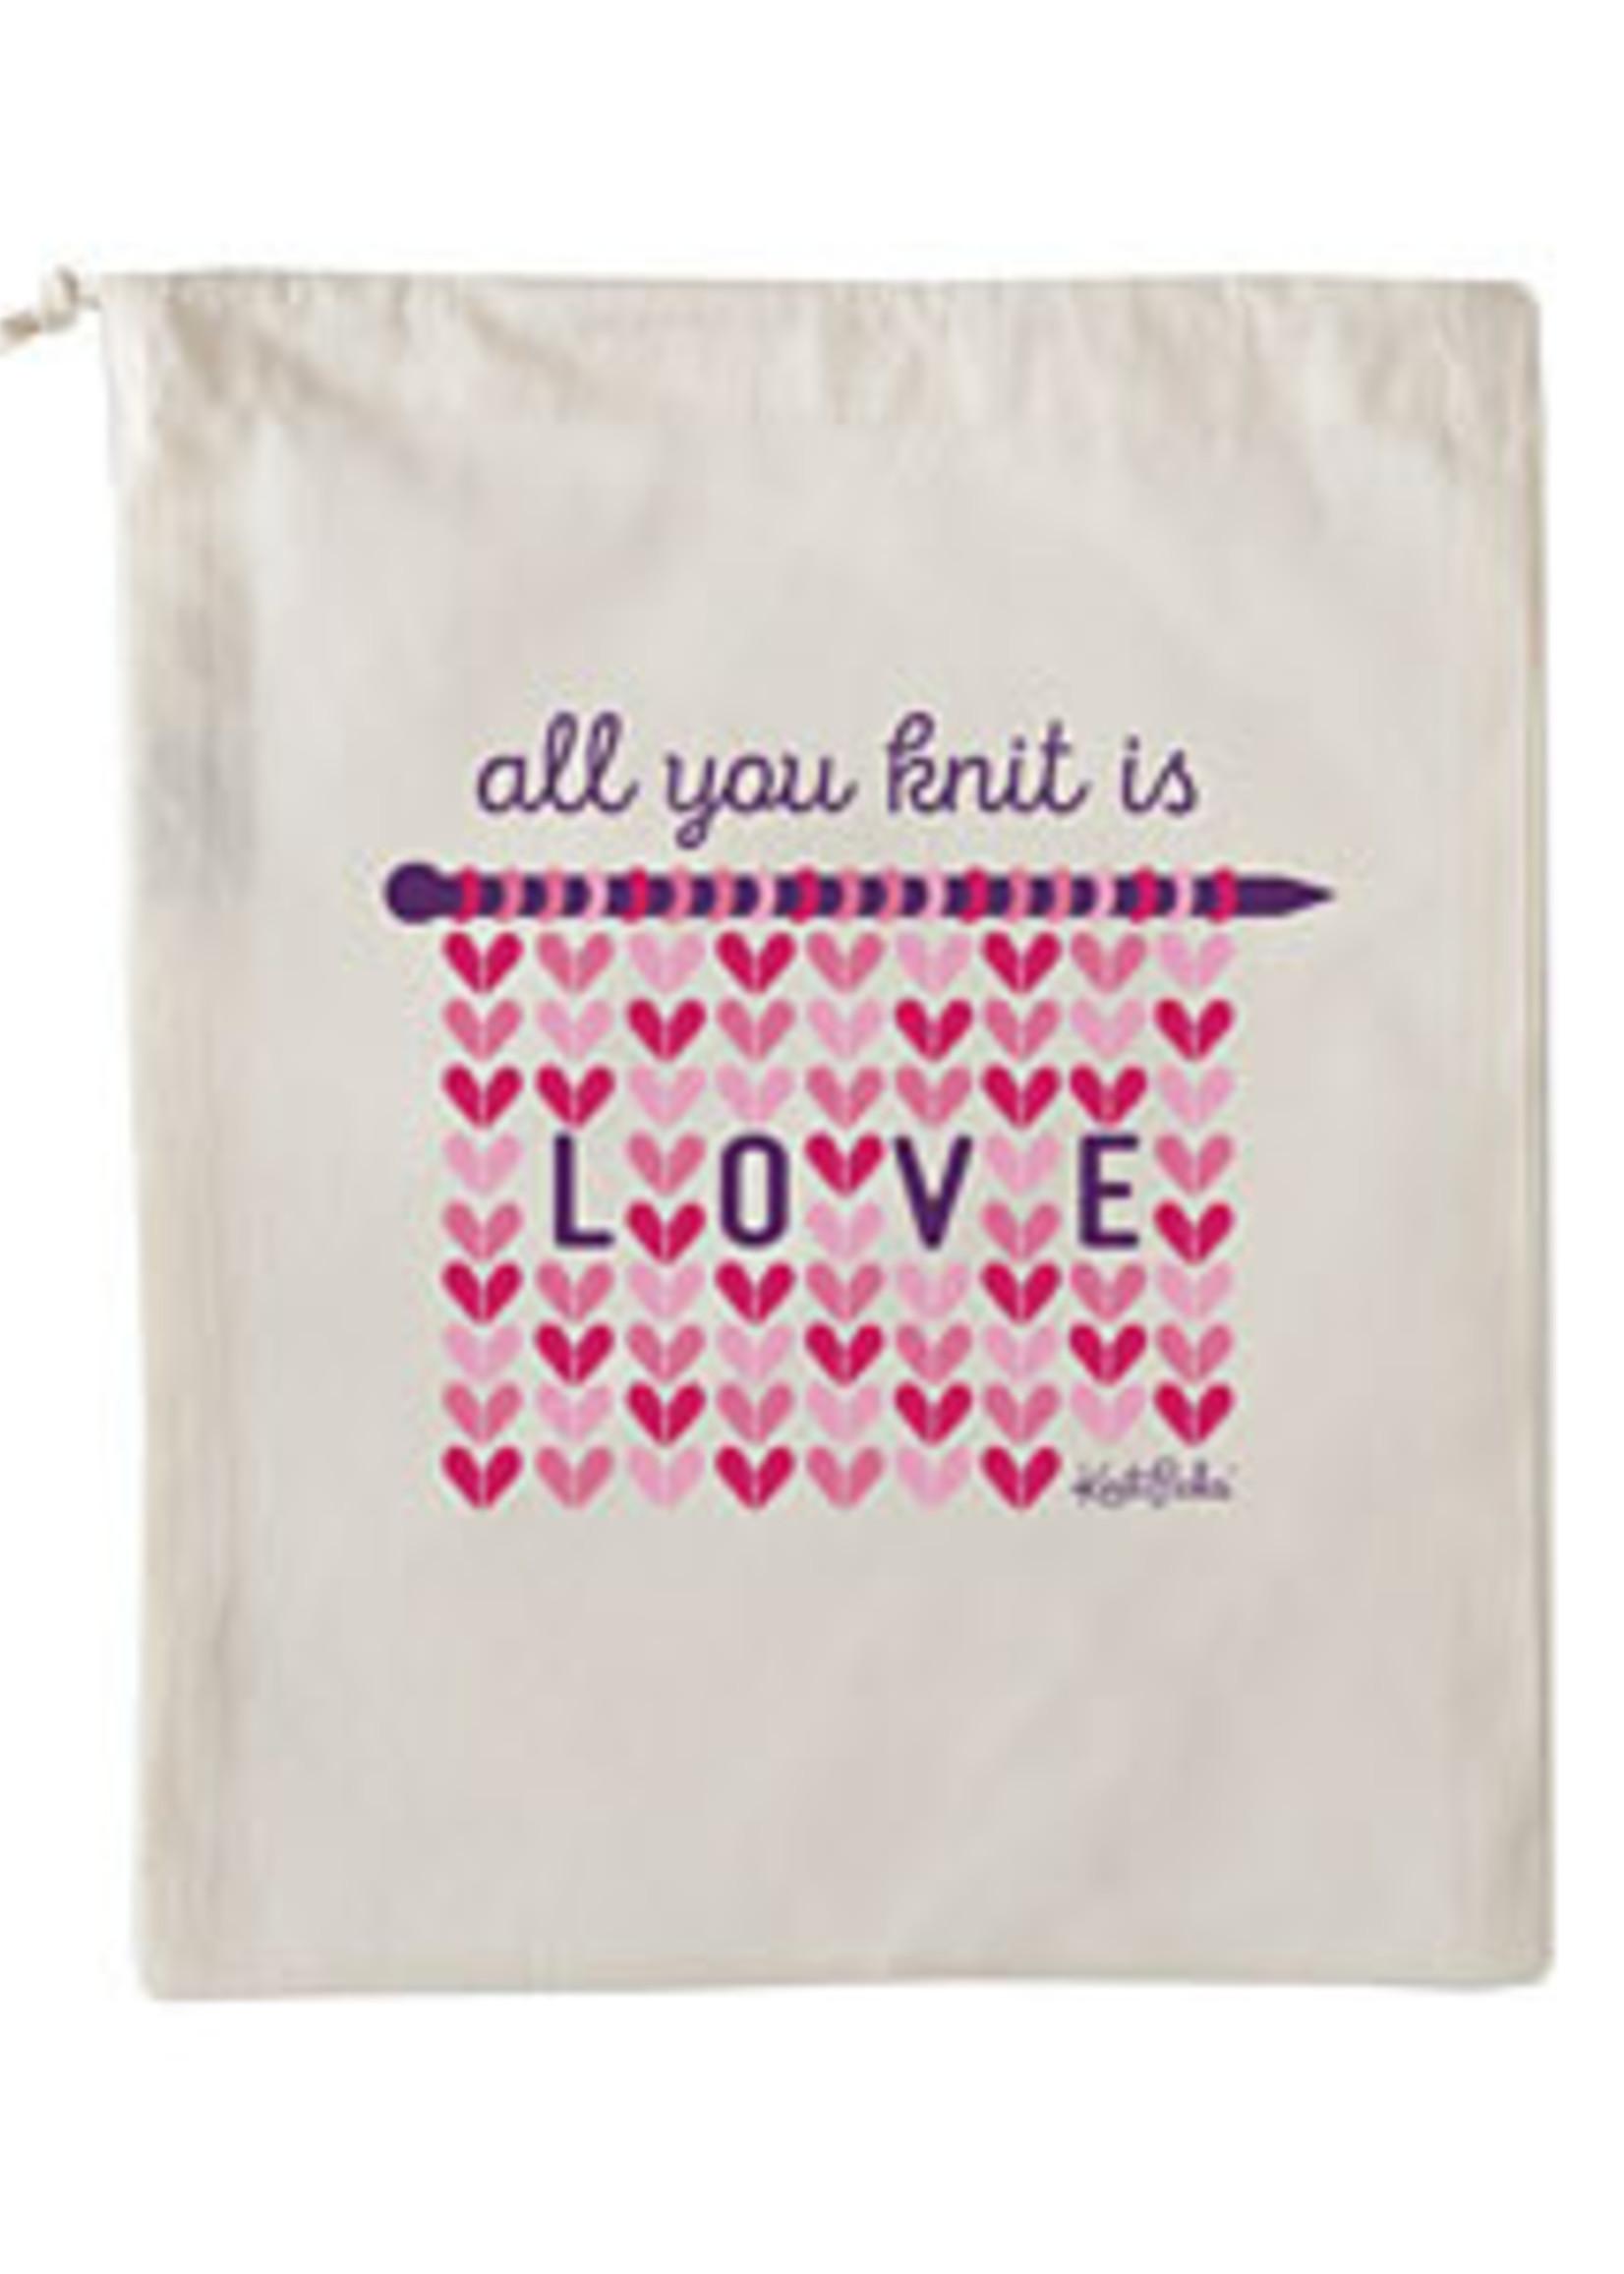 Knit Picks Knit Picks Project Bag - All You Knit is Love